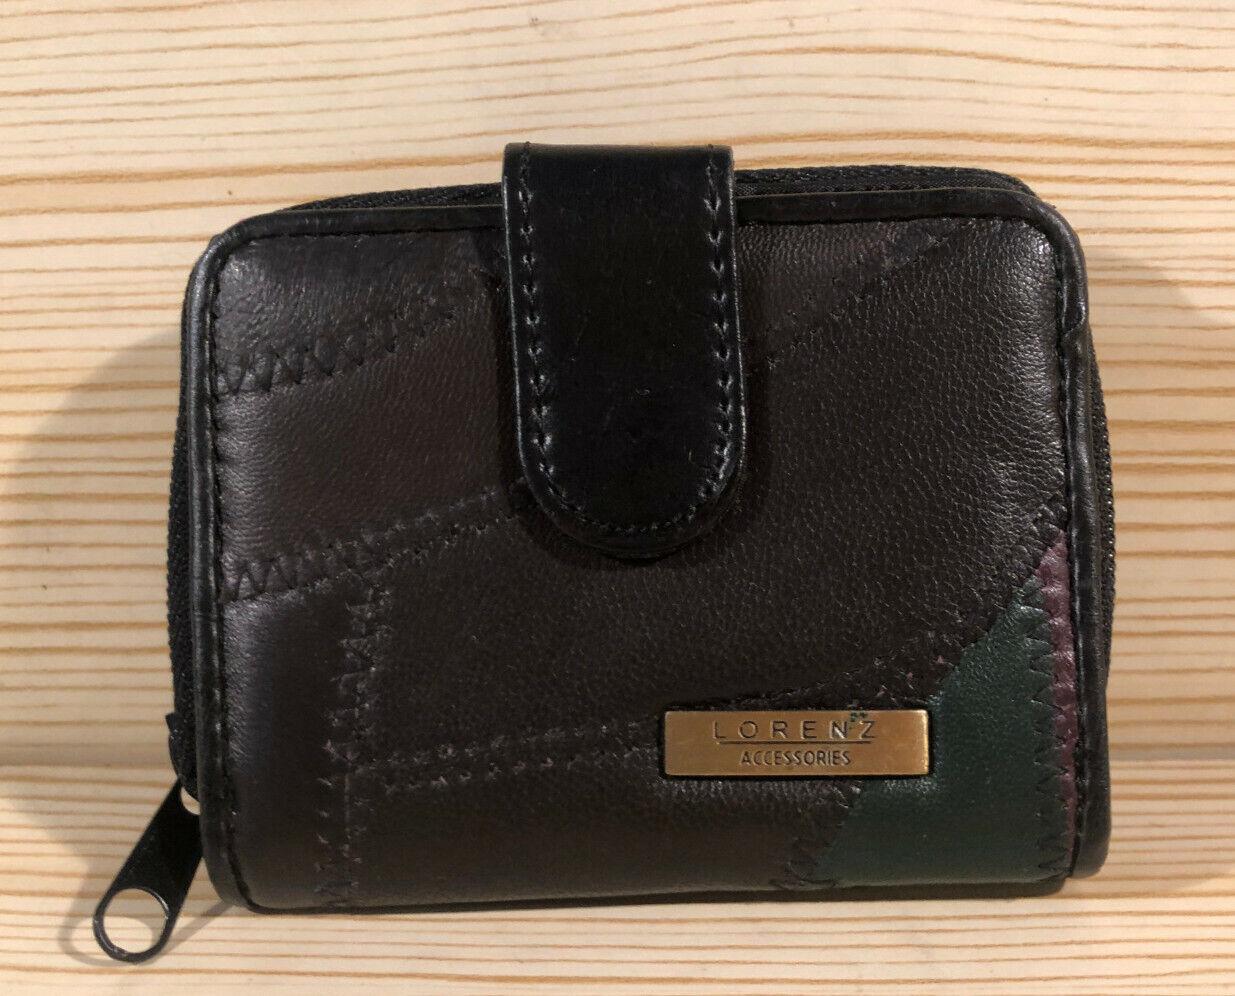 Lorenz Designer Ladies Soft Leather Purse Wallet with Large Coin Pocket Black